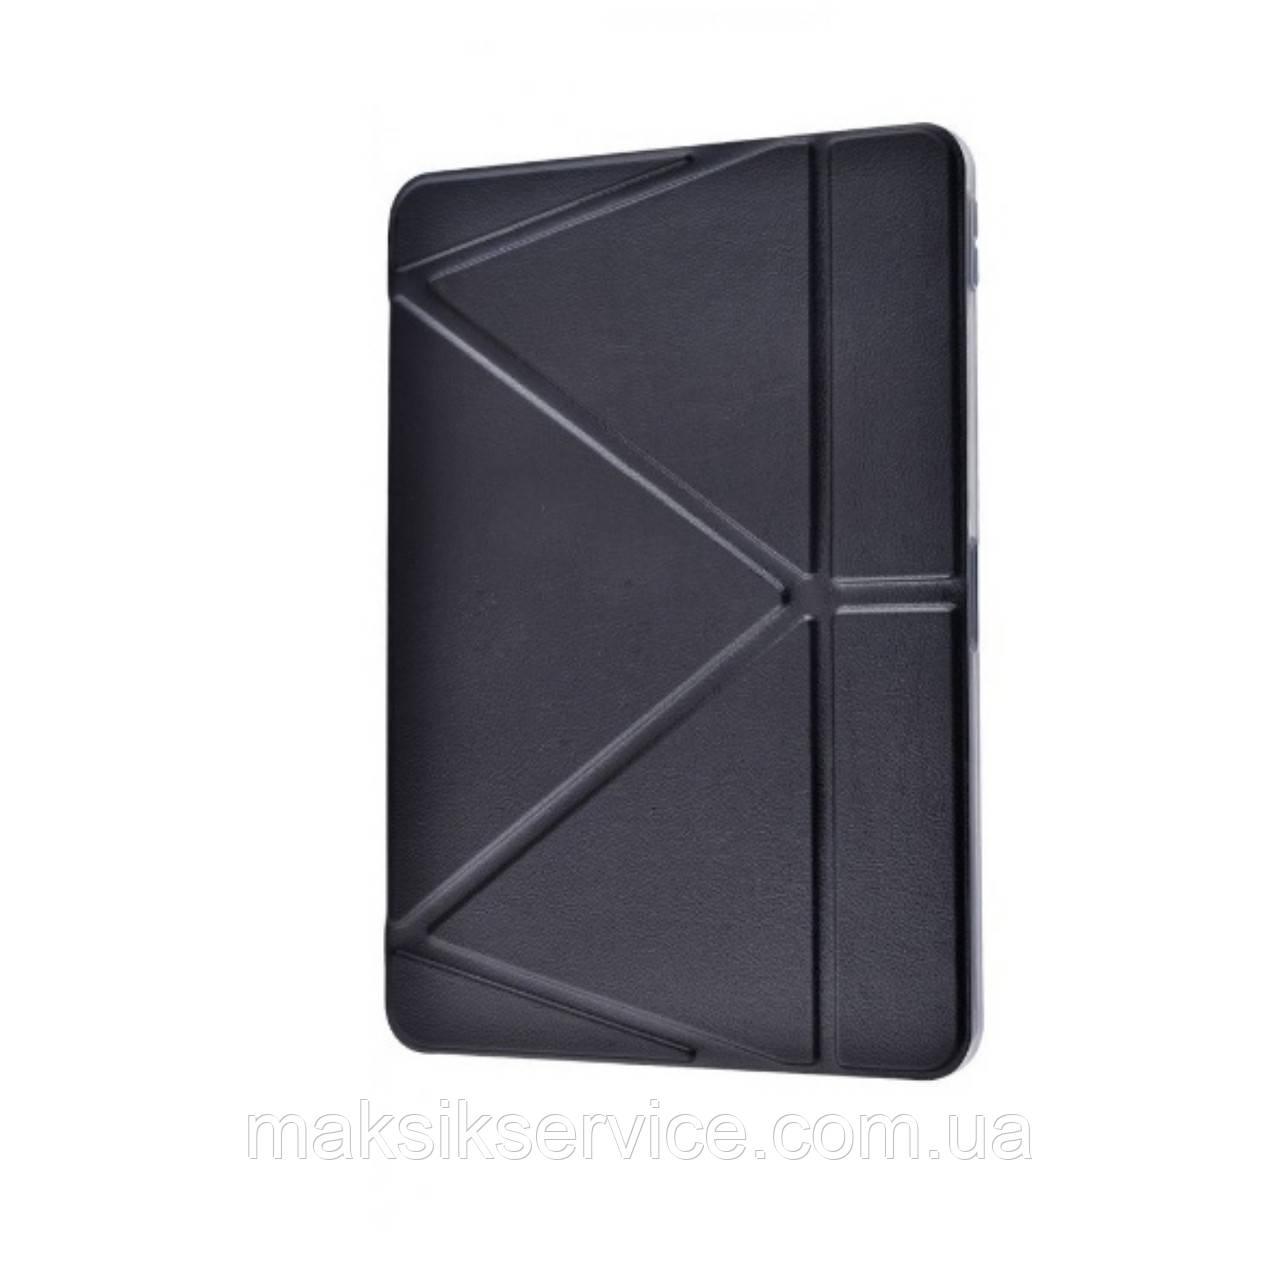 Чехол Origami New Design (TPU) iPad 2/3/4